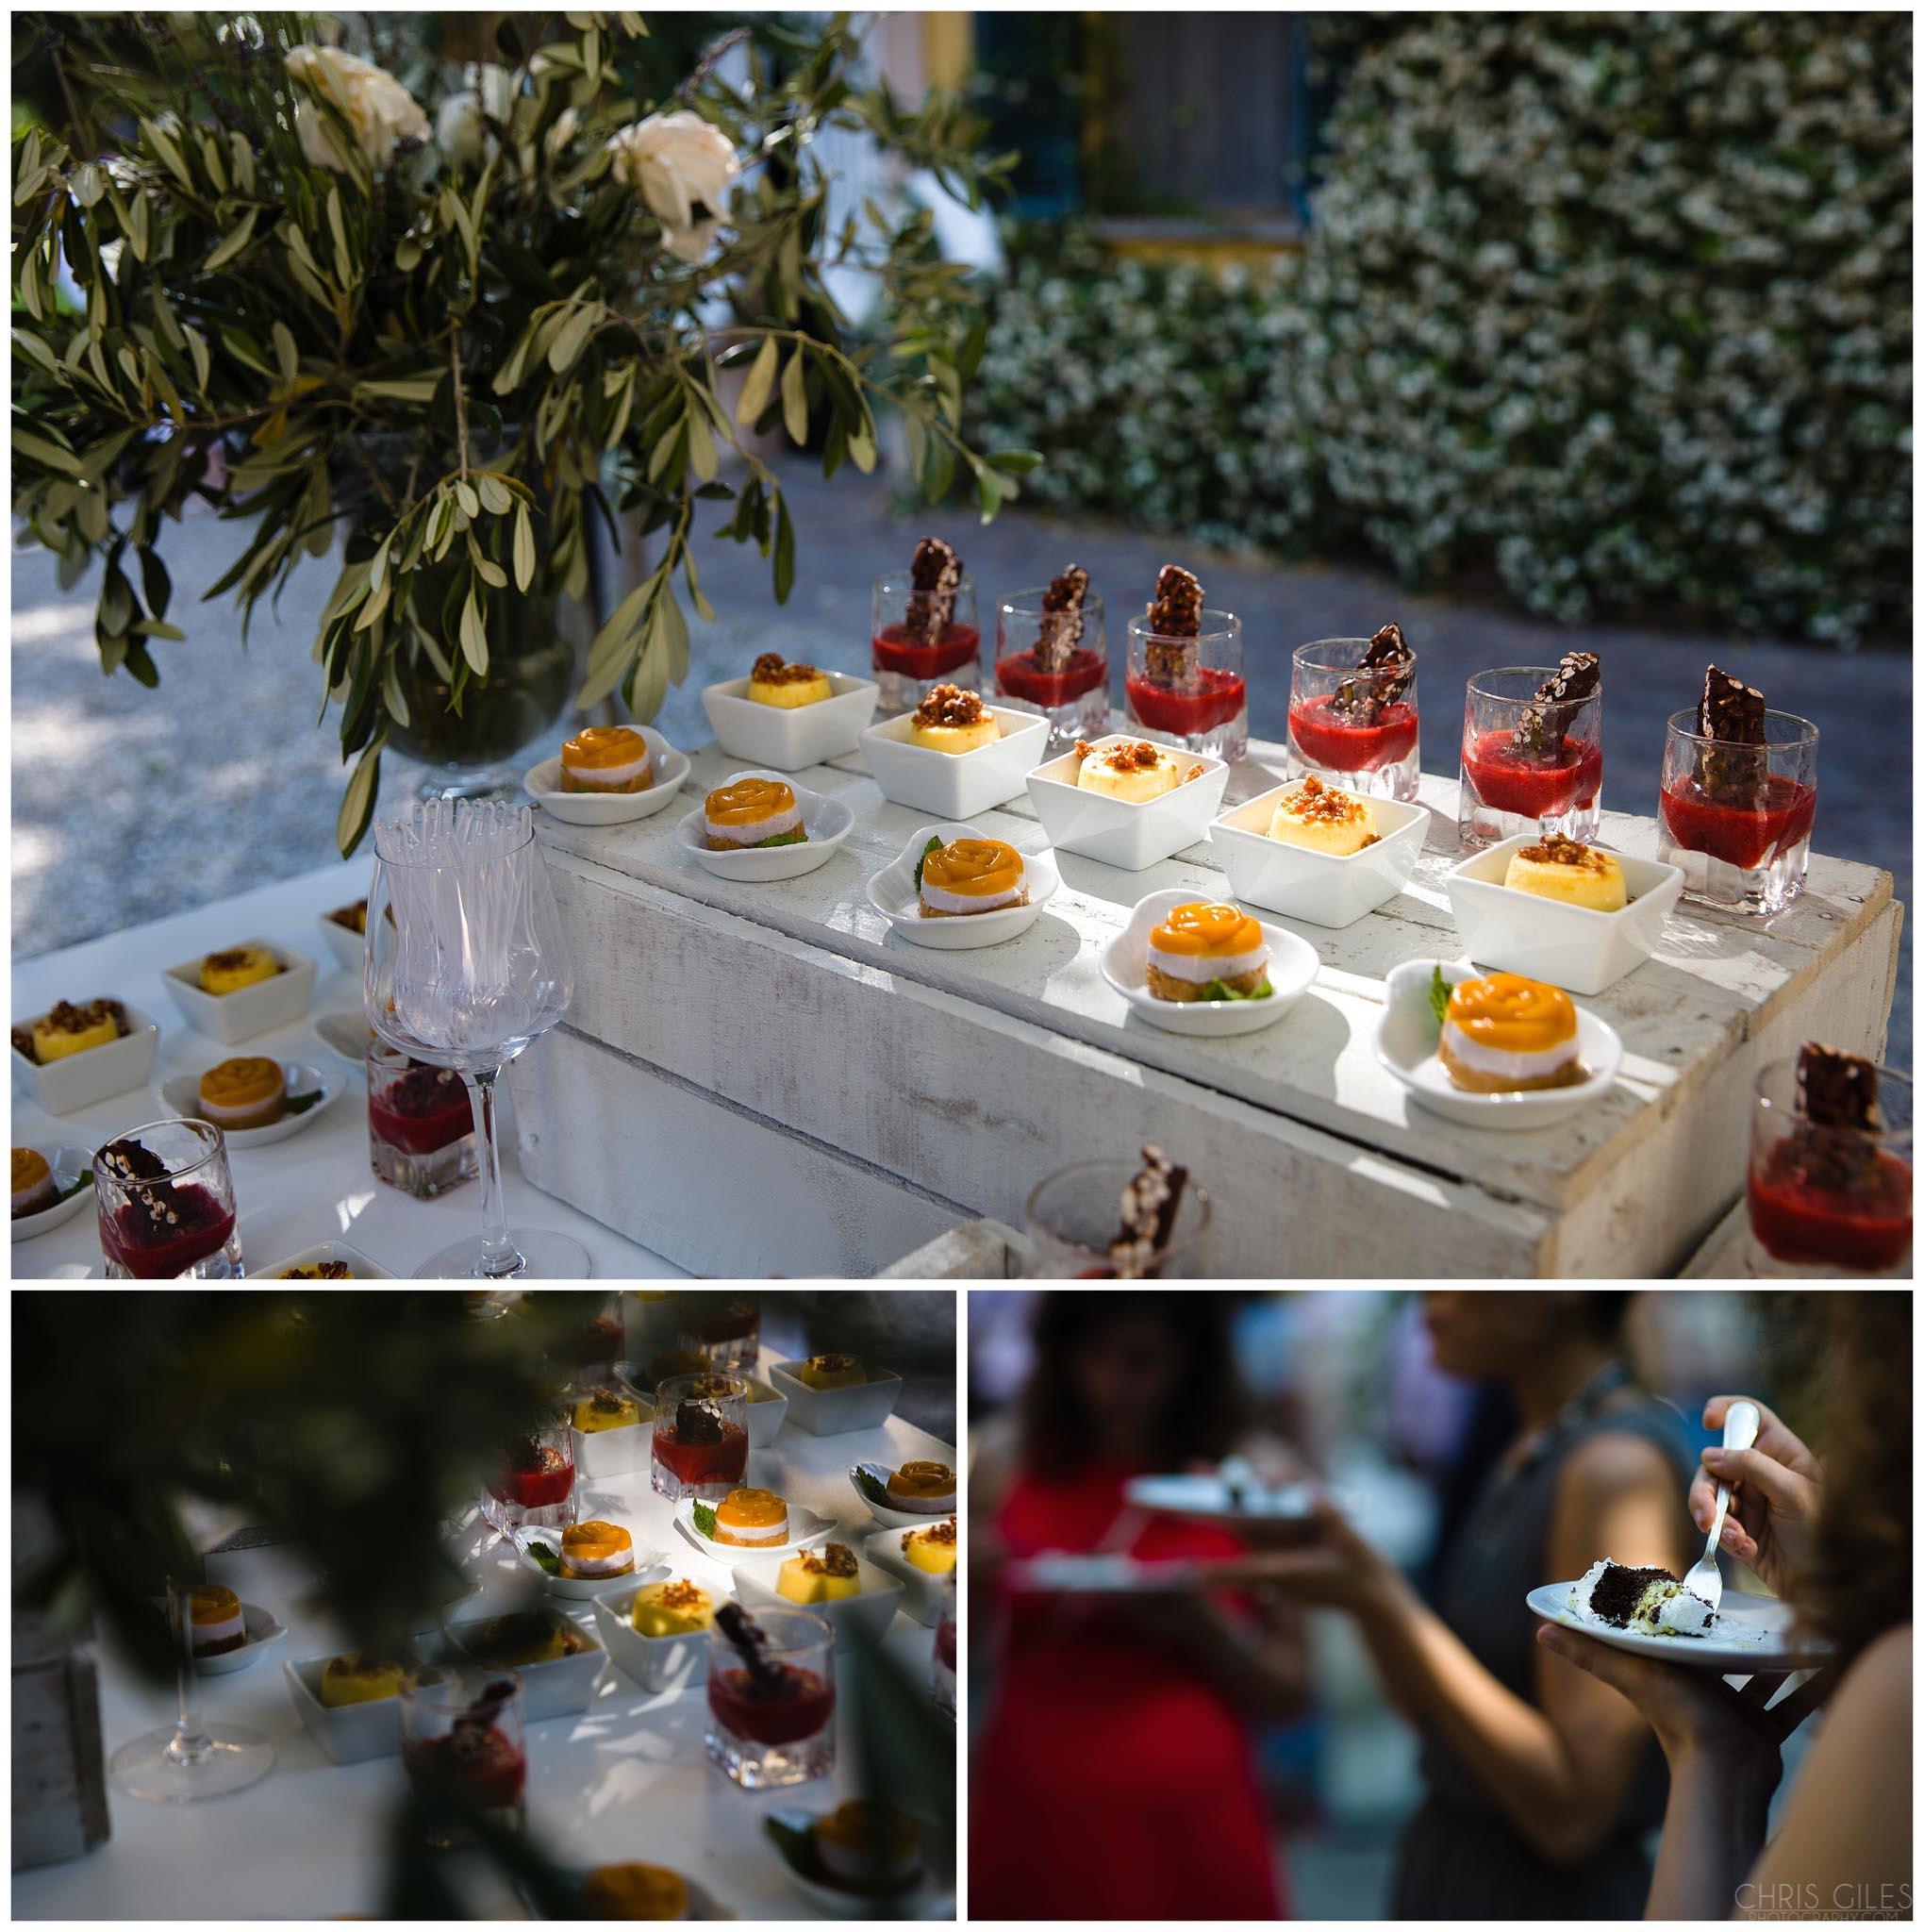 Italian wedding deserts